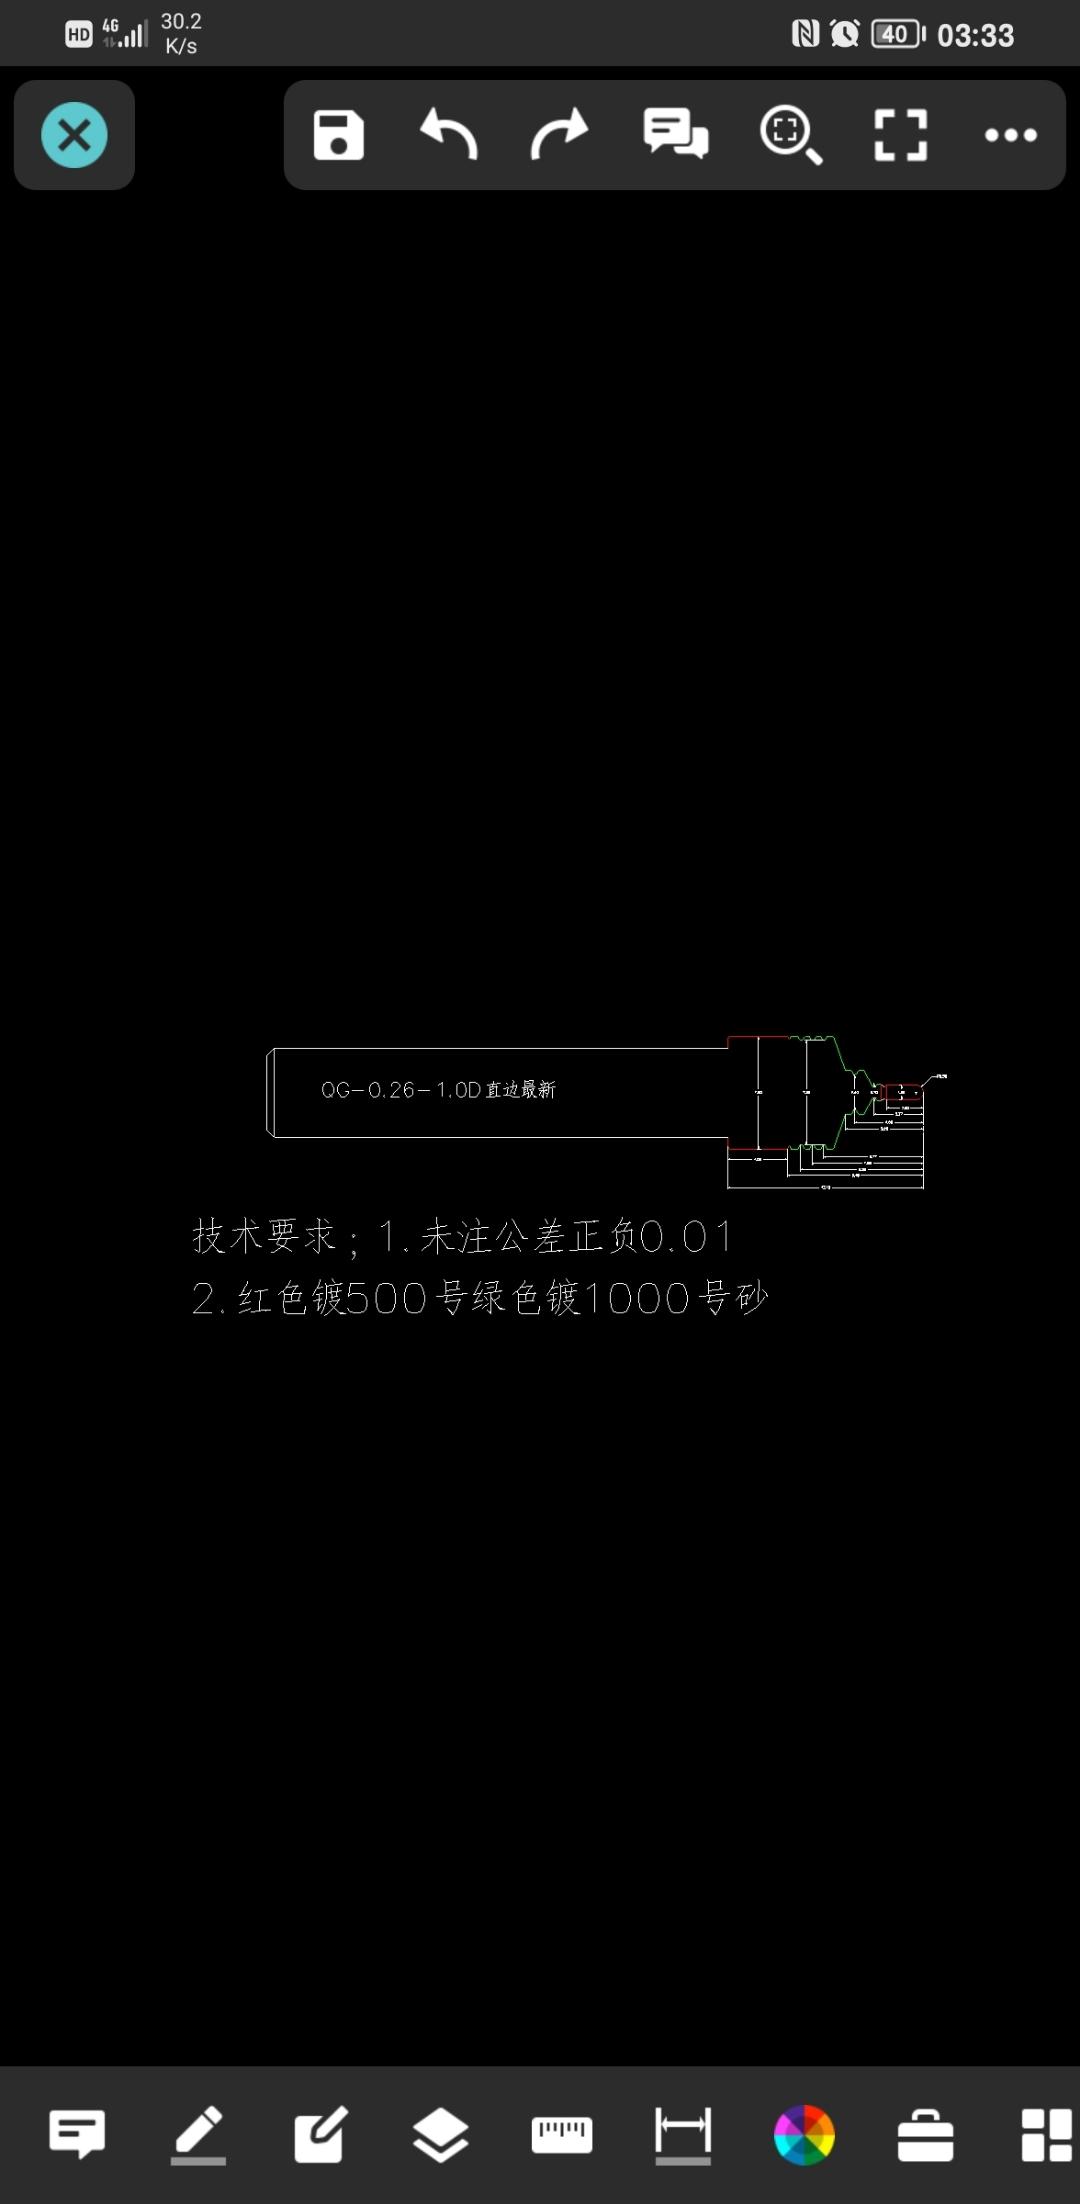 Screenshot_20210612_033304_com.gstarmc.android.jpg